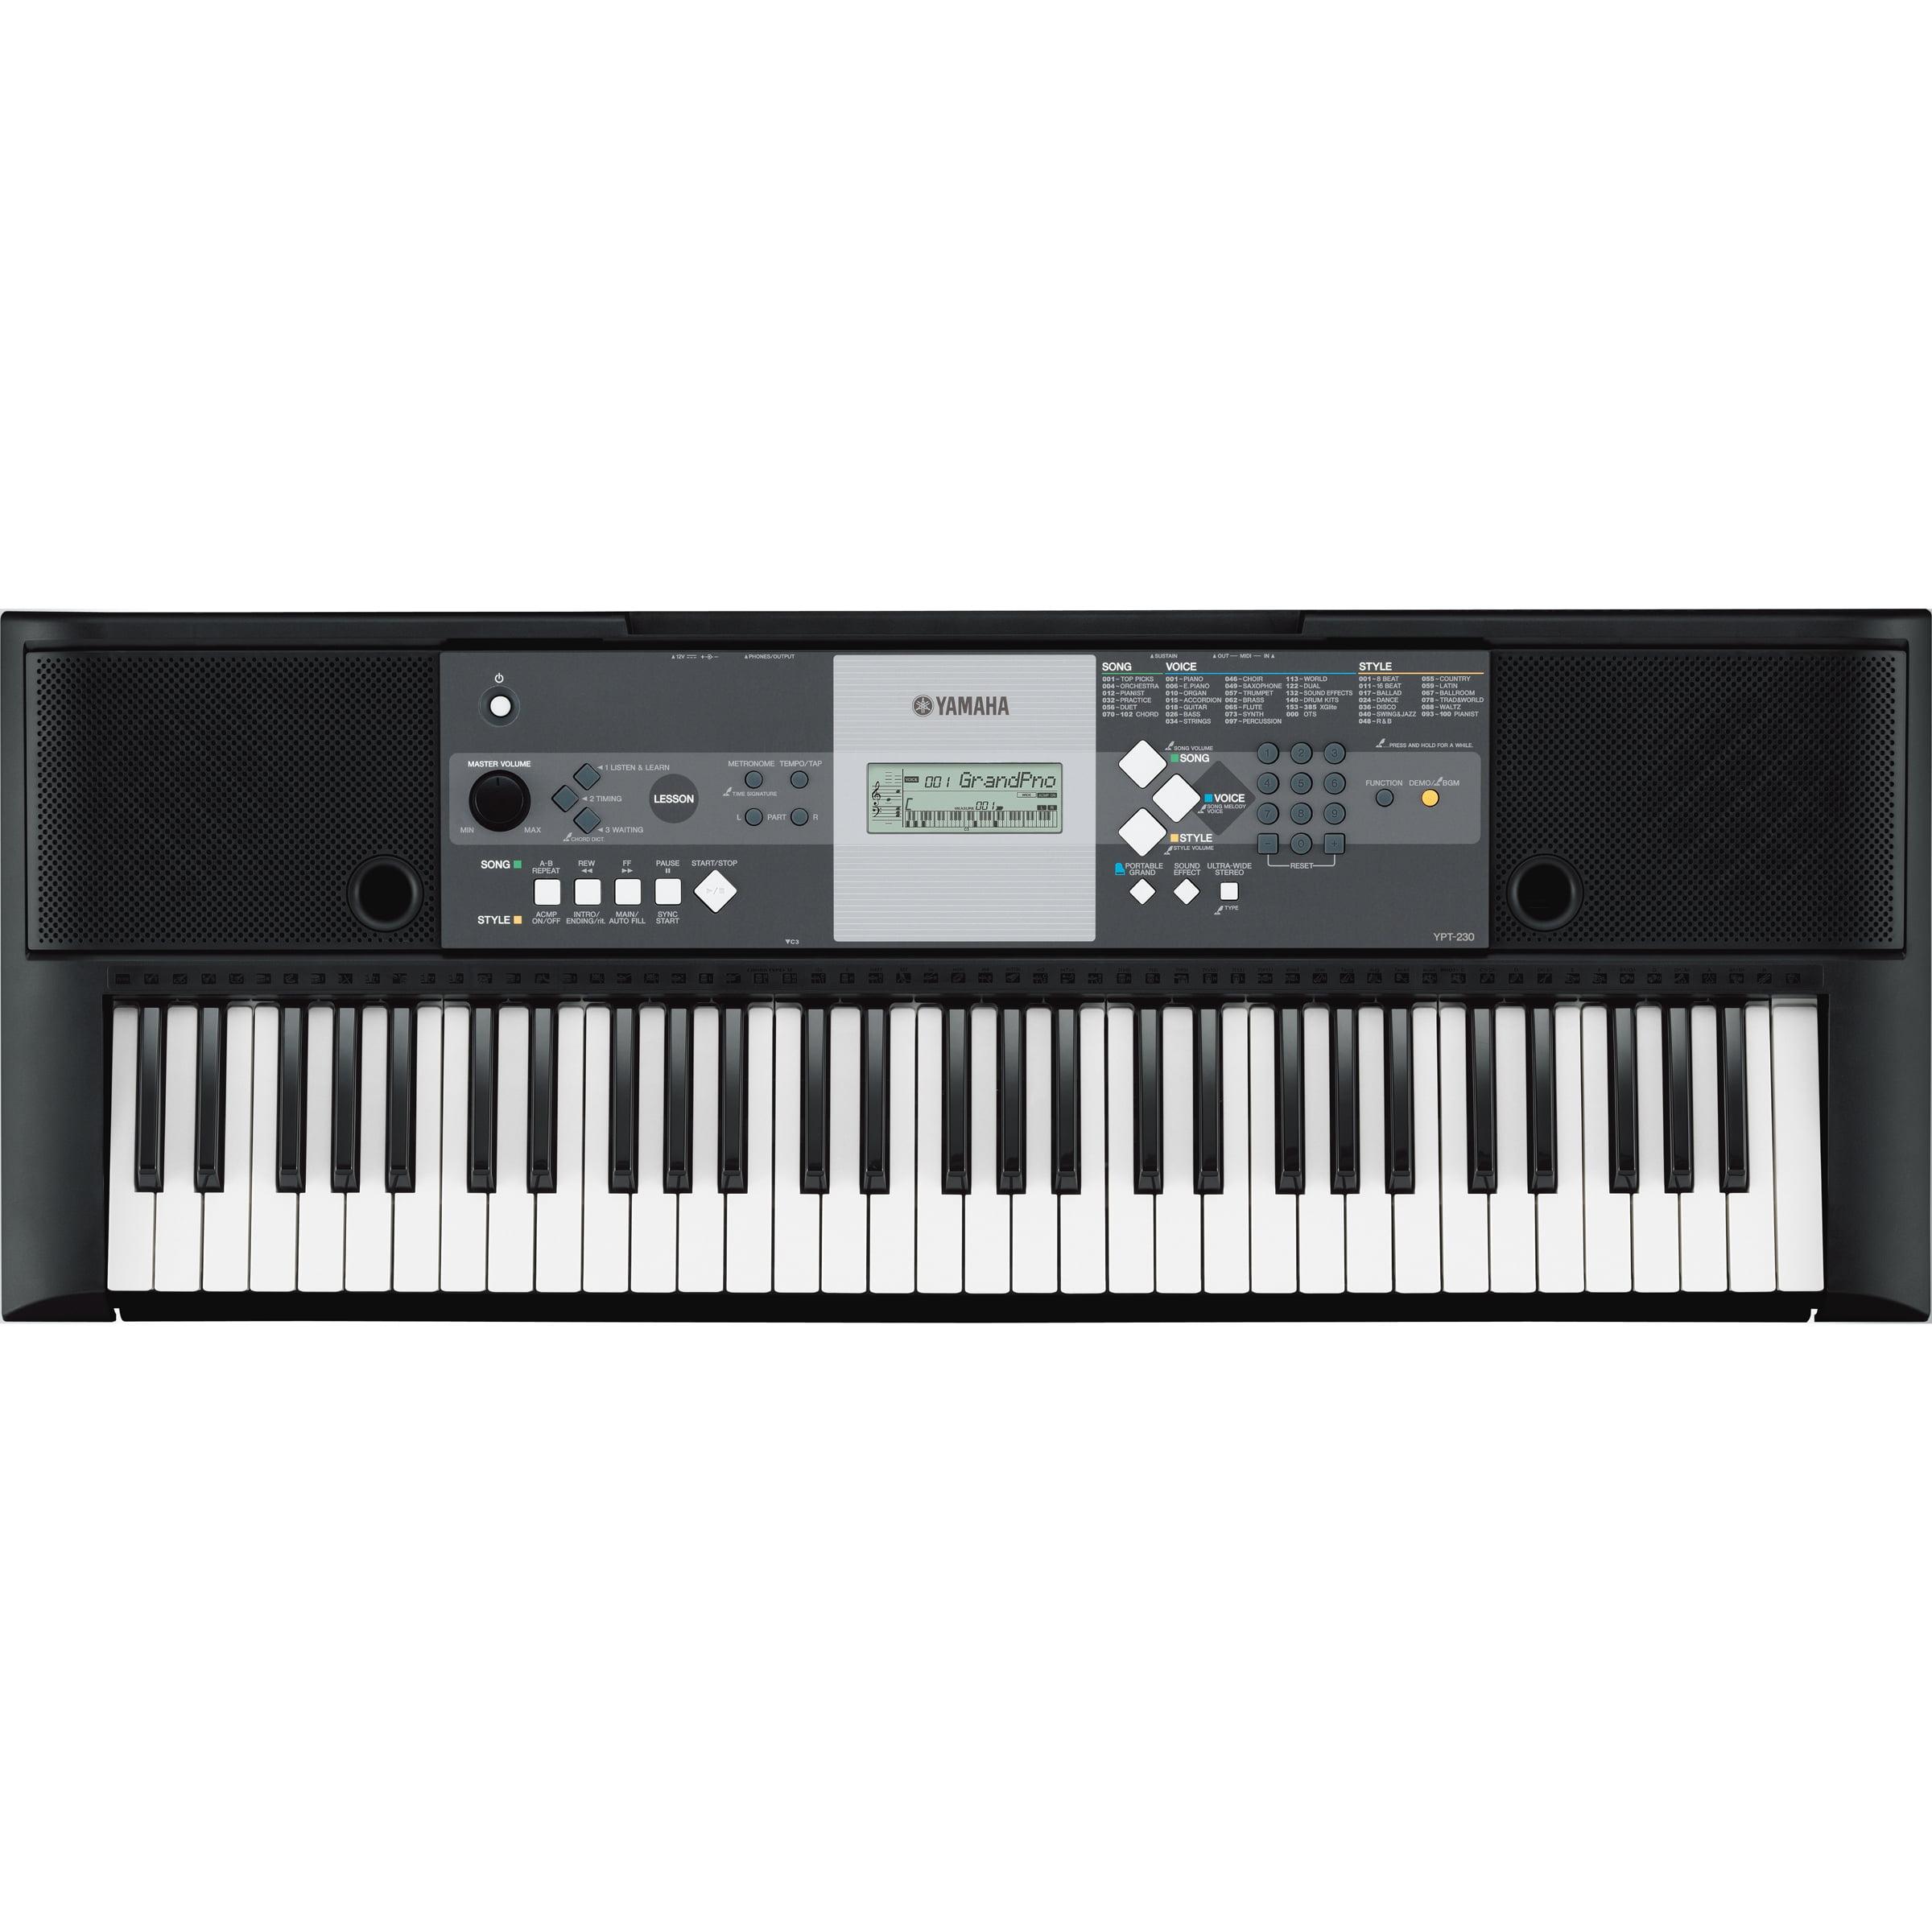 White Christmas 2020 Act 1 Ypt Yamaha Ypt 230 61 key Personal Keyboard   Walmart.  Walmart.com